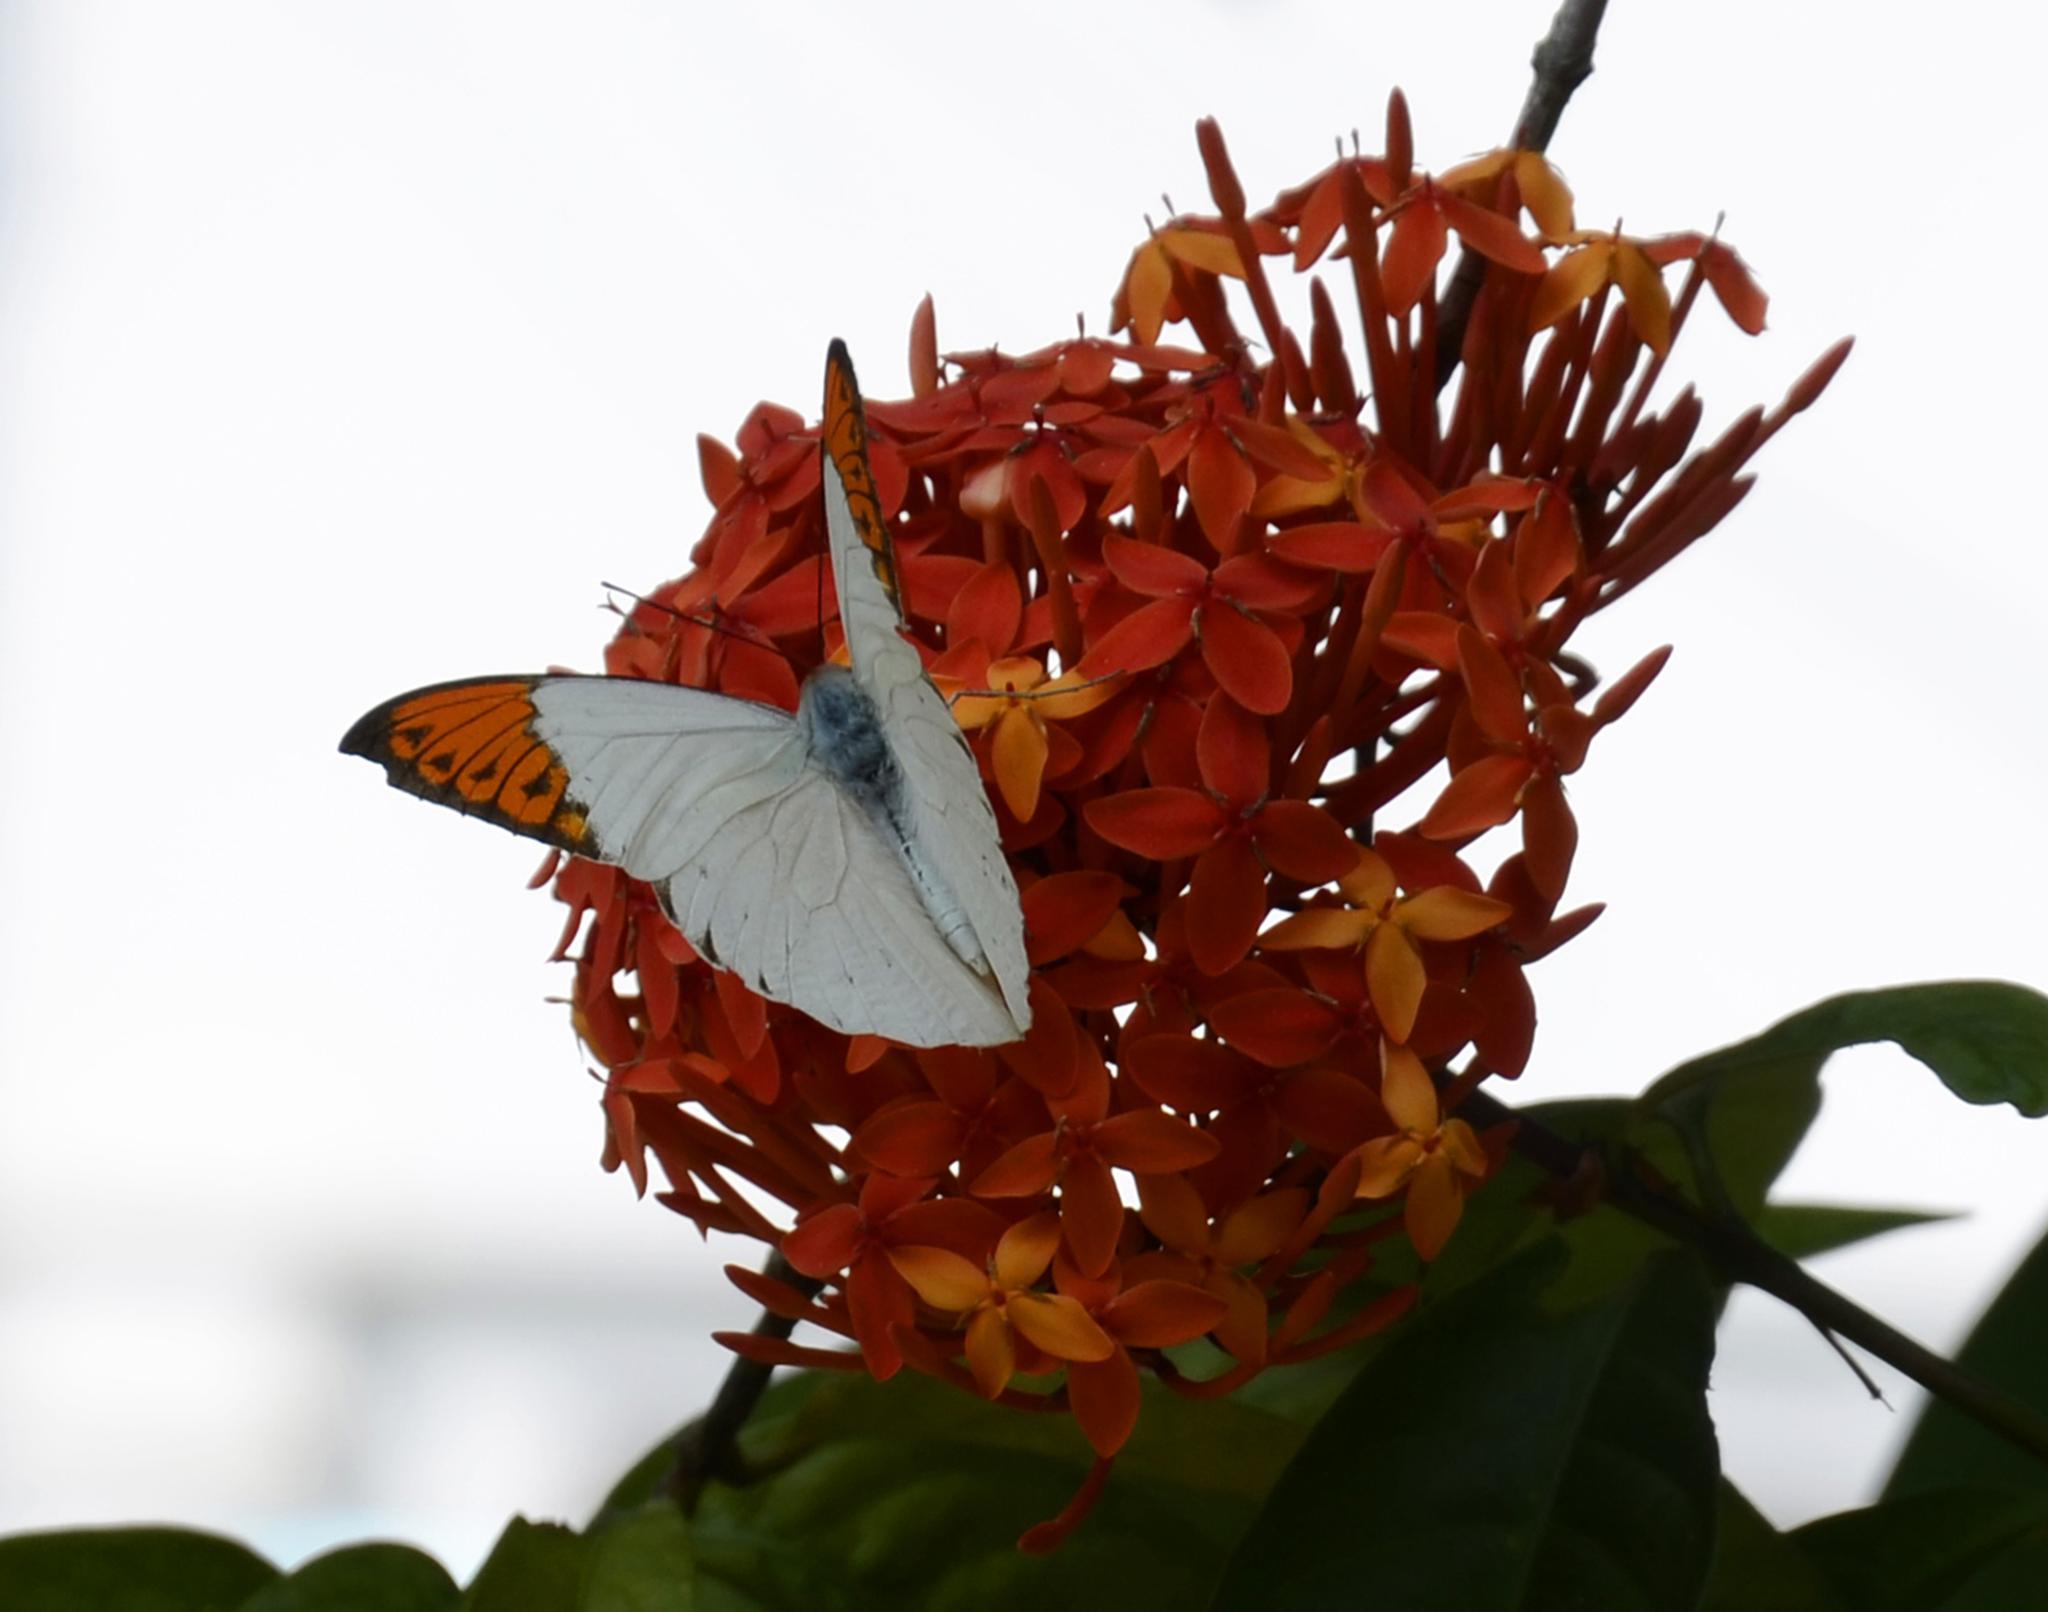 Butterfly by Shafiqul Islam Shiplu Photography